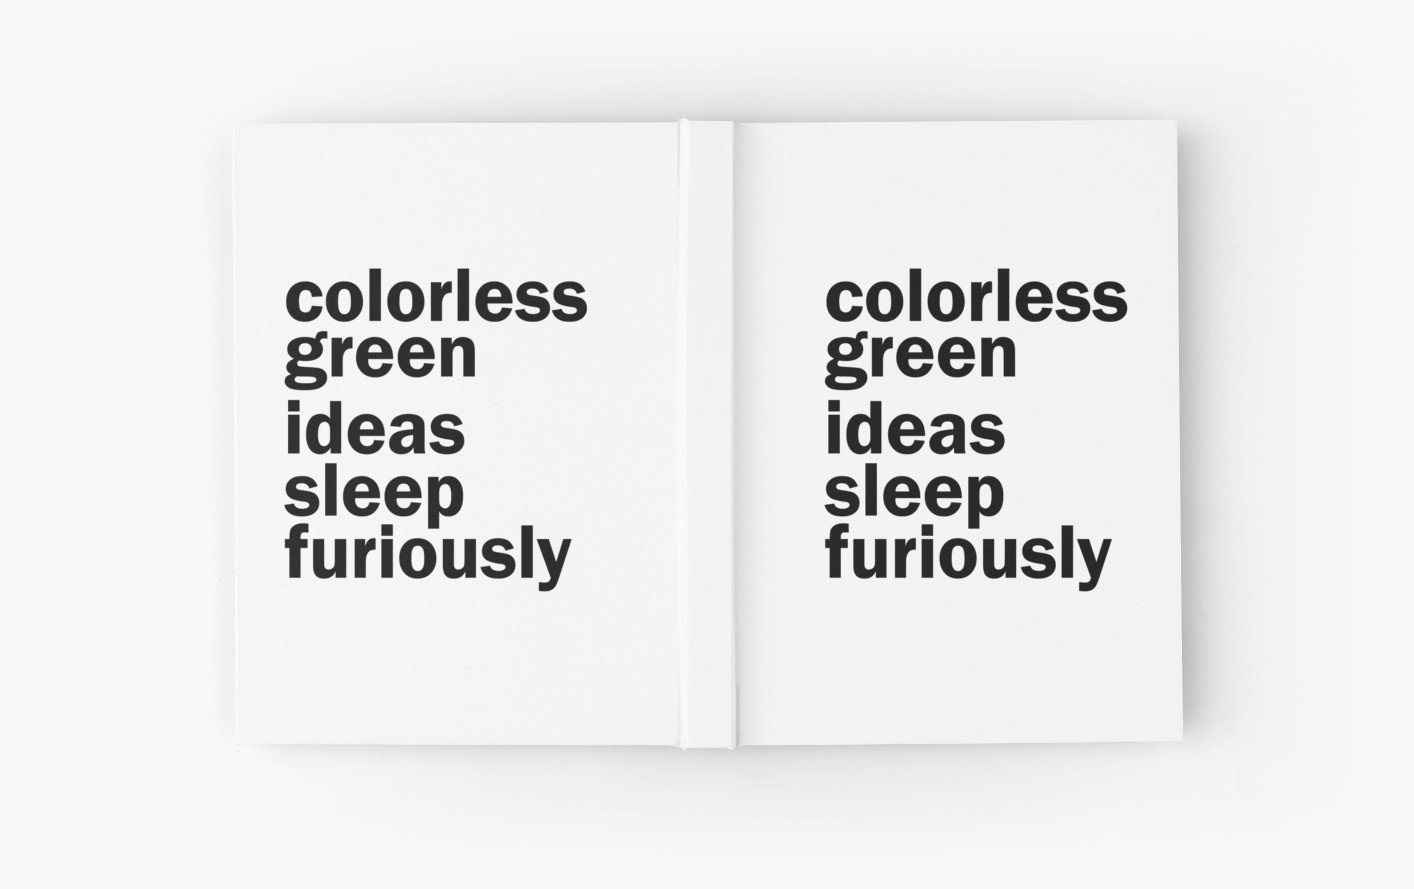 10 Gorgeous Colorless Green Ideas Sleep Furiously colorless green ideas sleep furiously white linguistics 1 2020